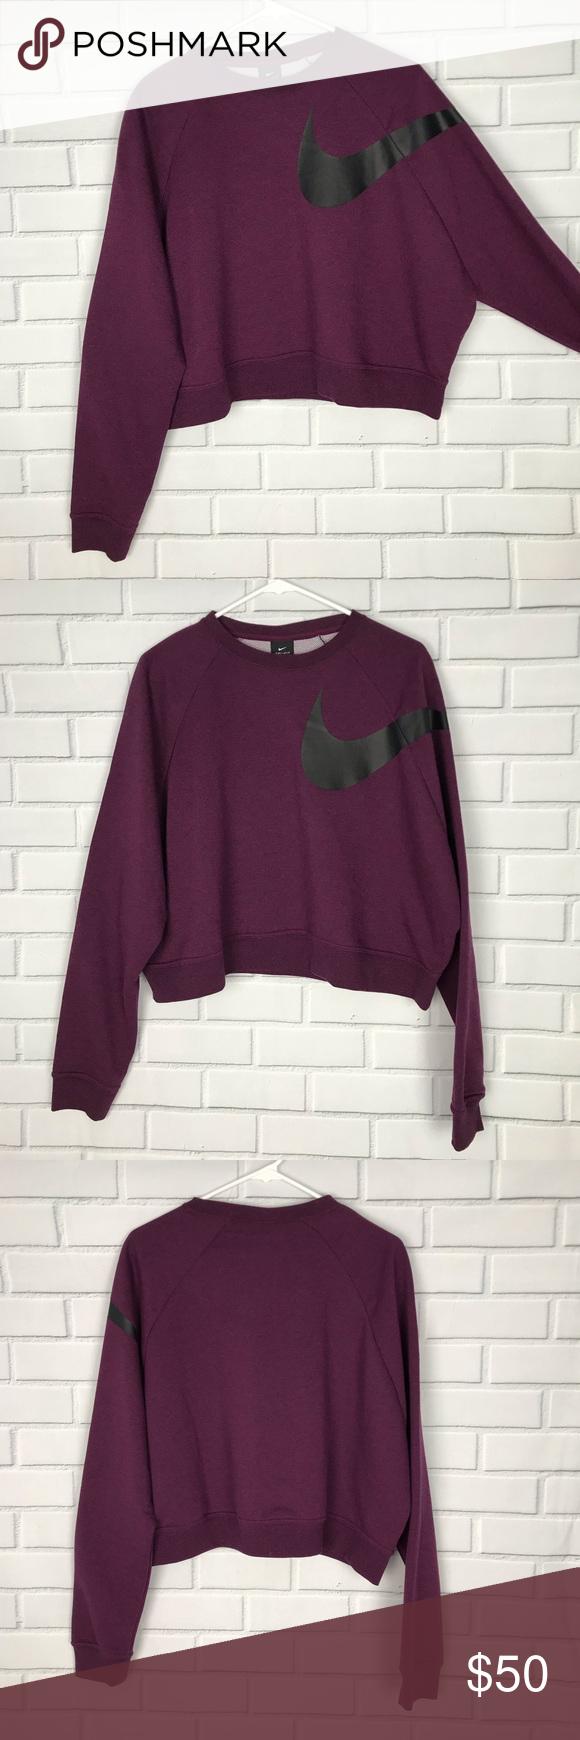 New Nike Dri Fit Cropped Crew Neck Sweatshirt Crew Neck Sweatshirt Clothes Design Hot Fashion [ 1740 x 580 Pixel ]